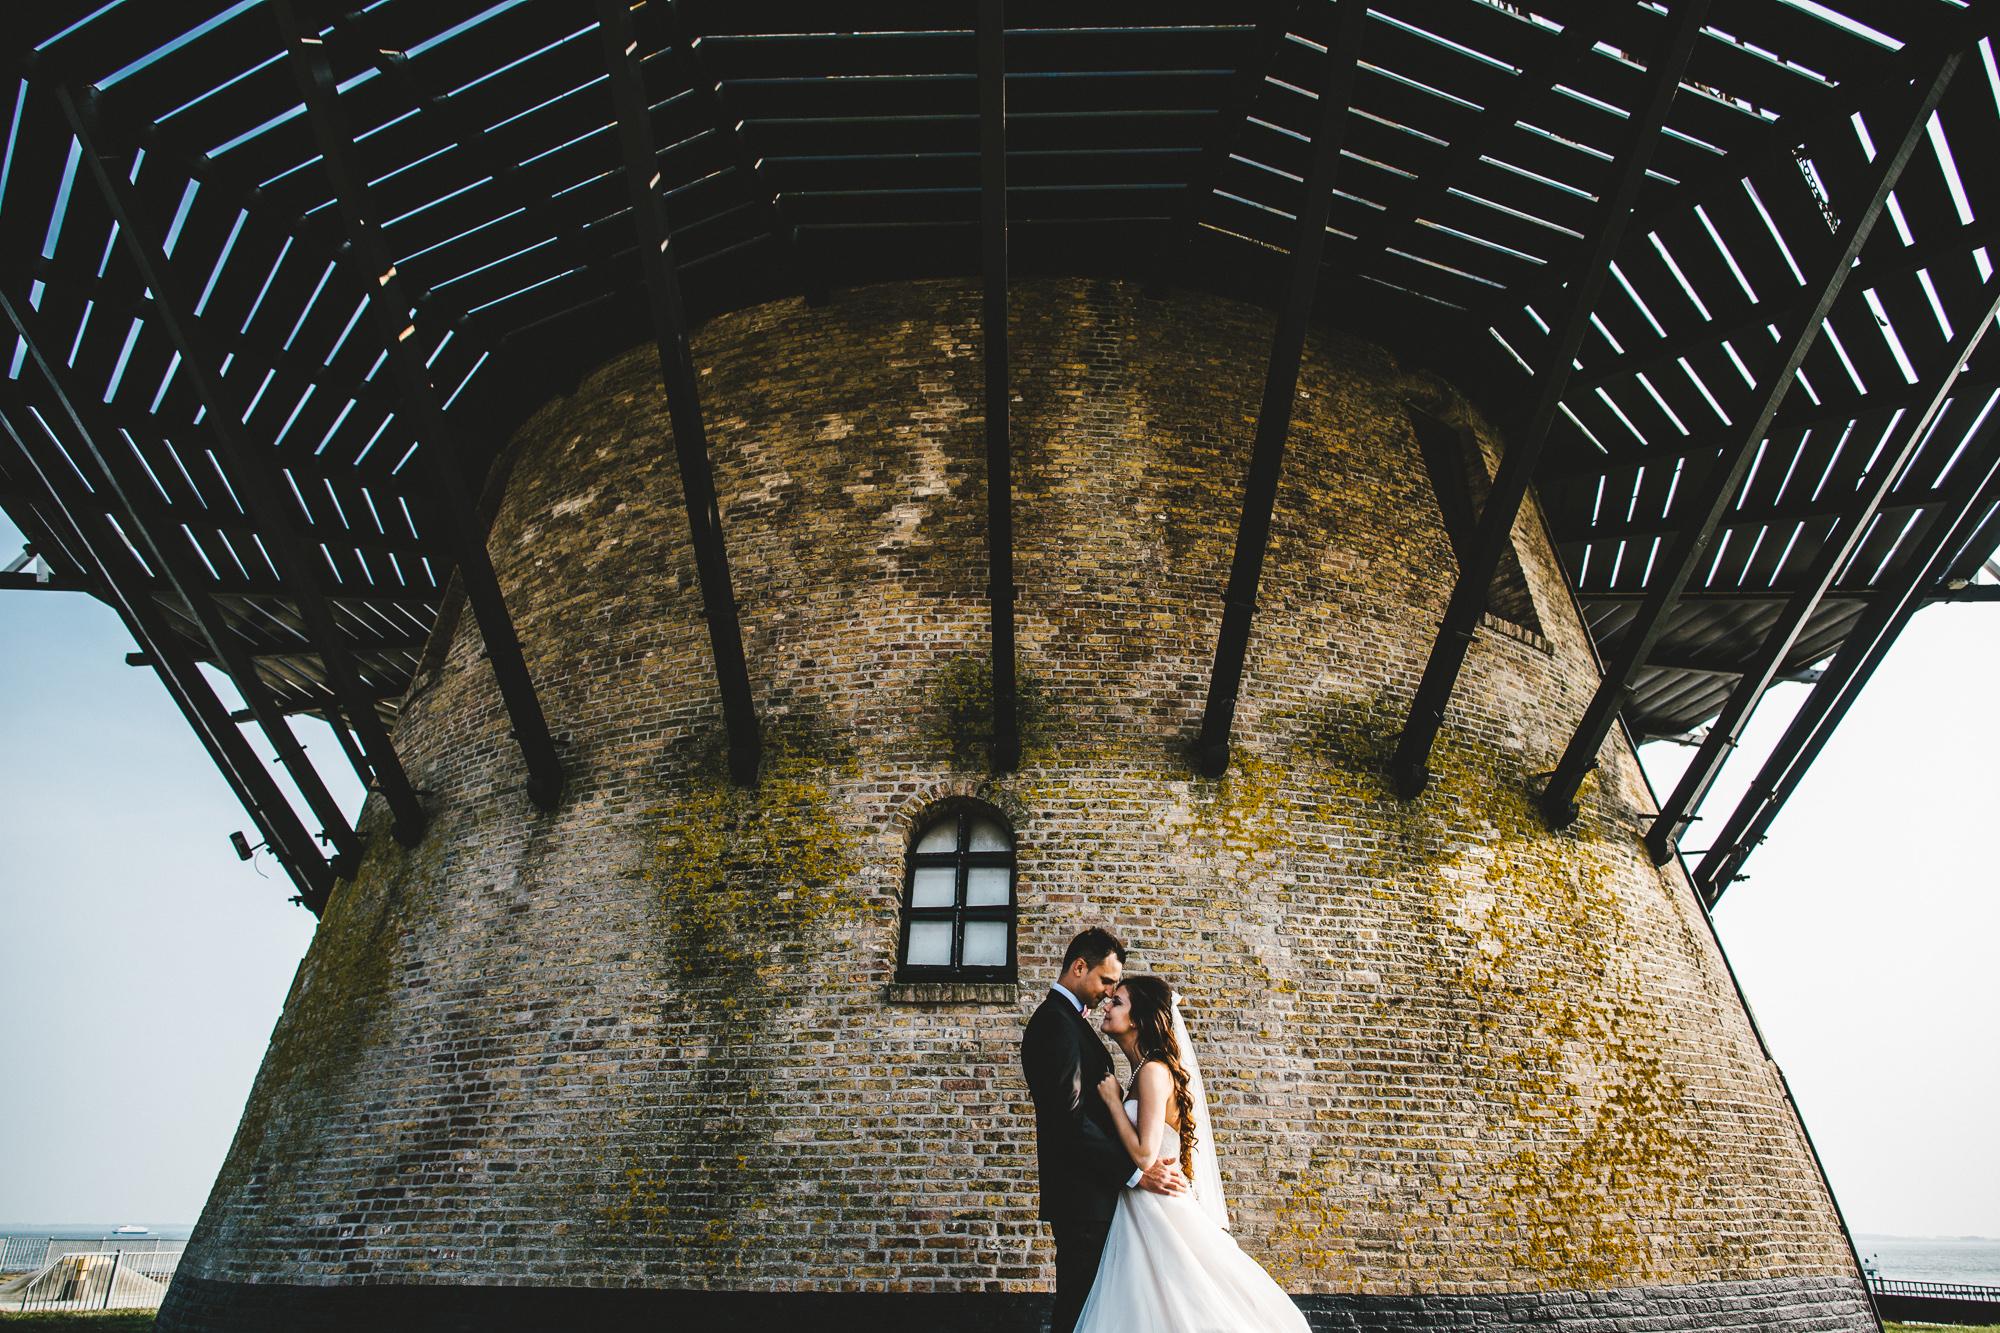 after wedding ia 015 - Afterwedding in Zeeland / Holland